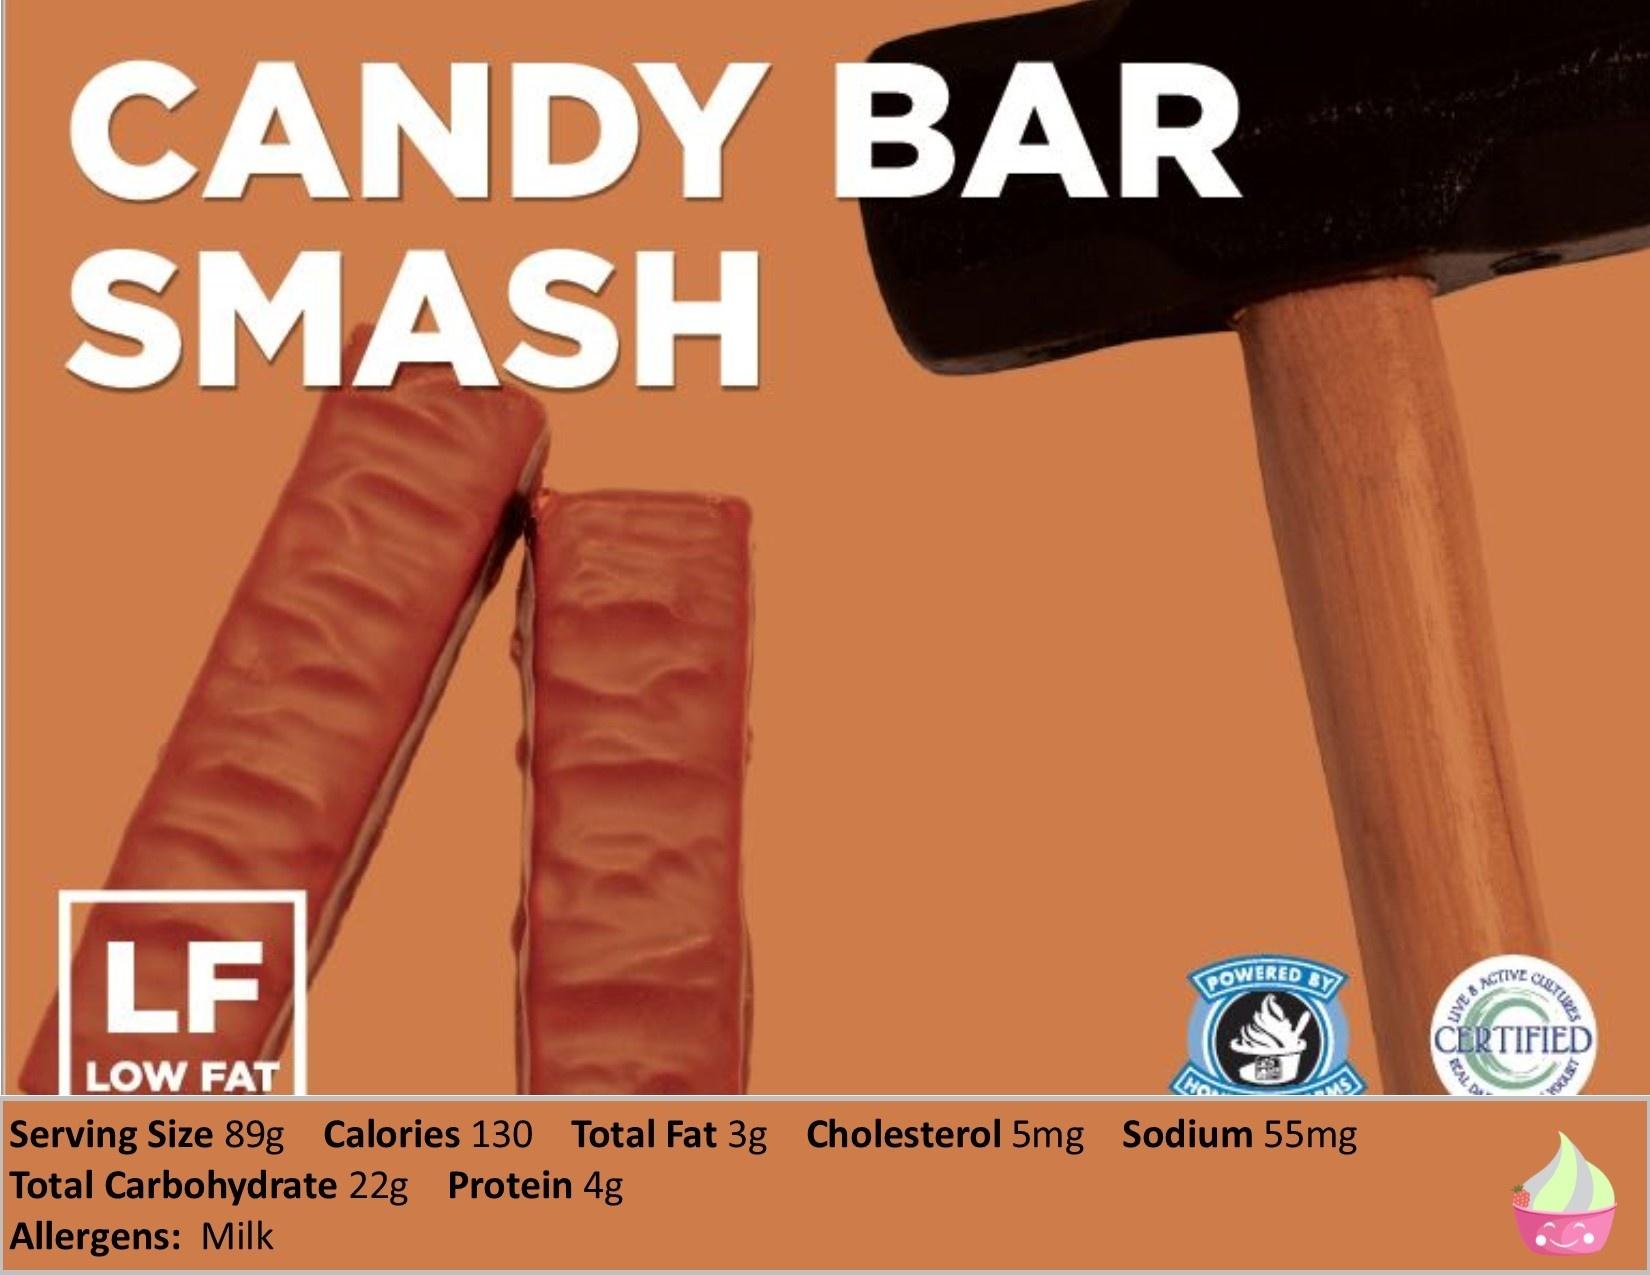 https://0201.nccdn.net/1_2/000/000/0bb/765/Candy-Bar-Smash-LF-1650x1275-1650x1275.jpg